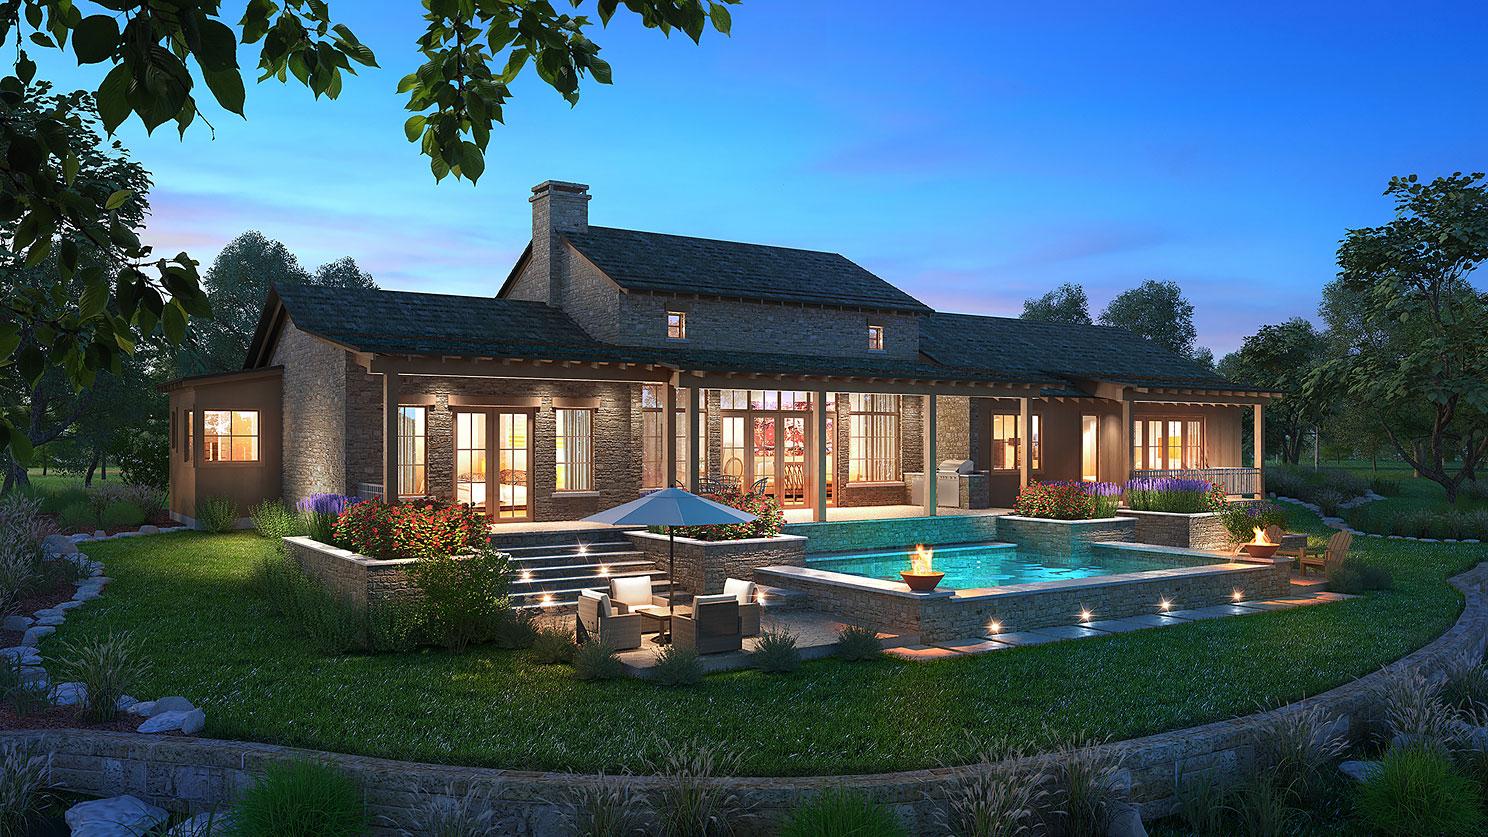 616056 Digital Photorealistic Architectural Renderings of Boot Ranch Villas Texas Live Oak Backard for Wheelock Communities